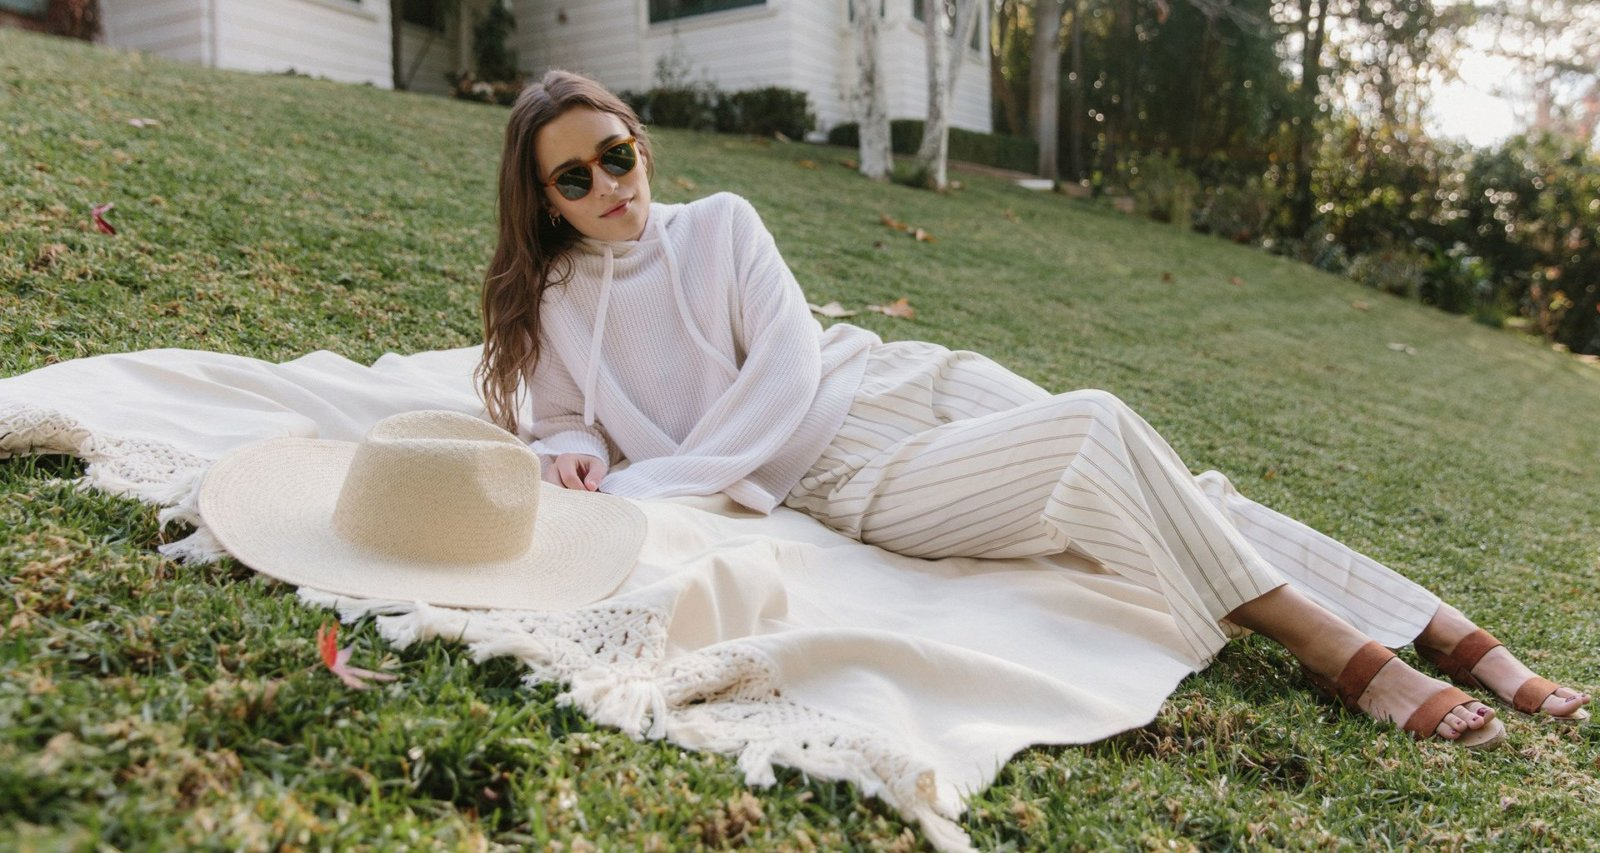 Spree Commerce powers Jenni Kayne's ultimate California lifestyle brand